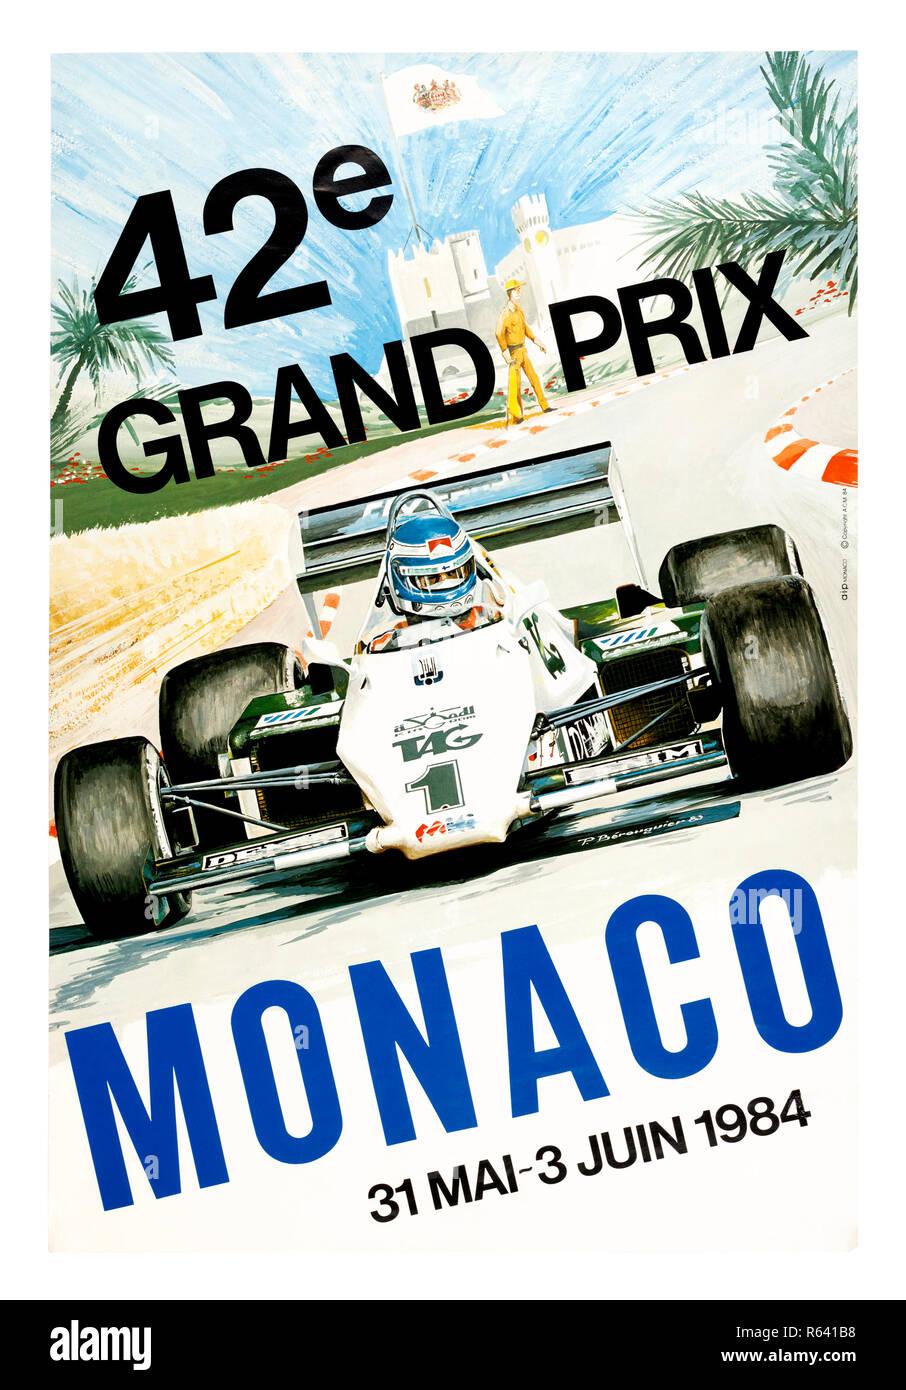 Vintage poster for the 1984 Monaco Grand Prix Formula 1 race - Stock Image